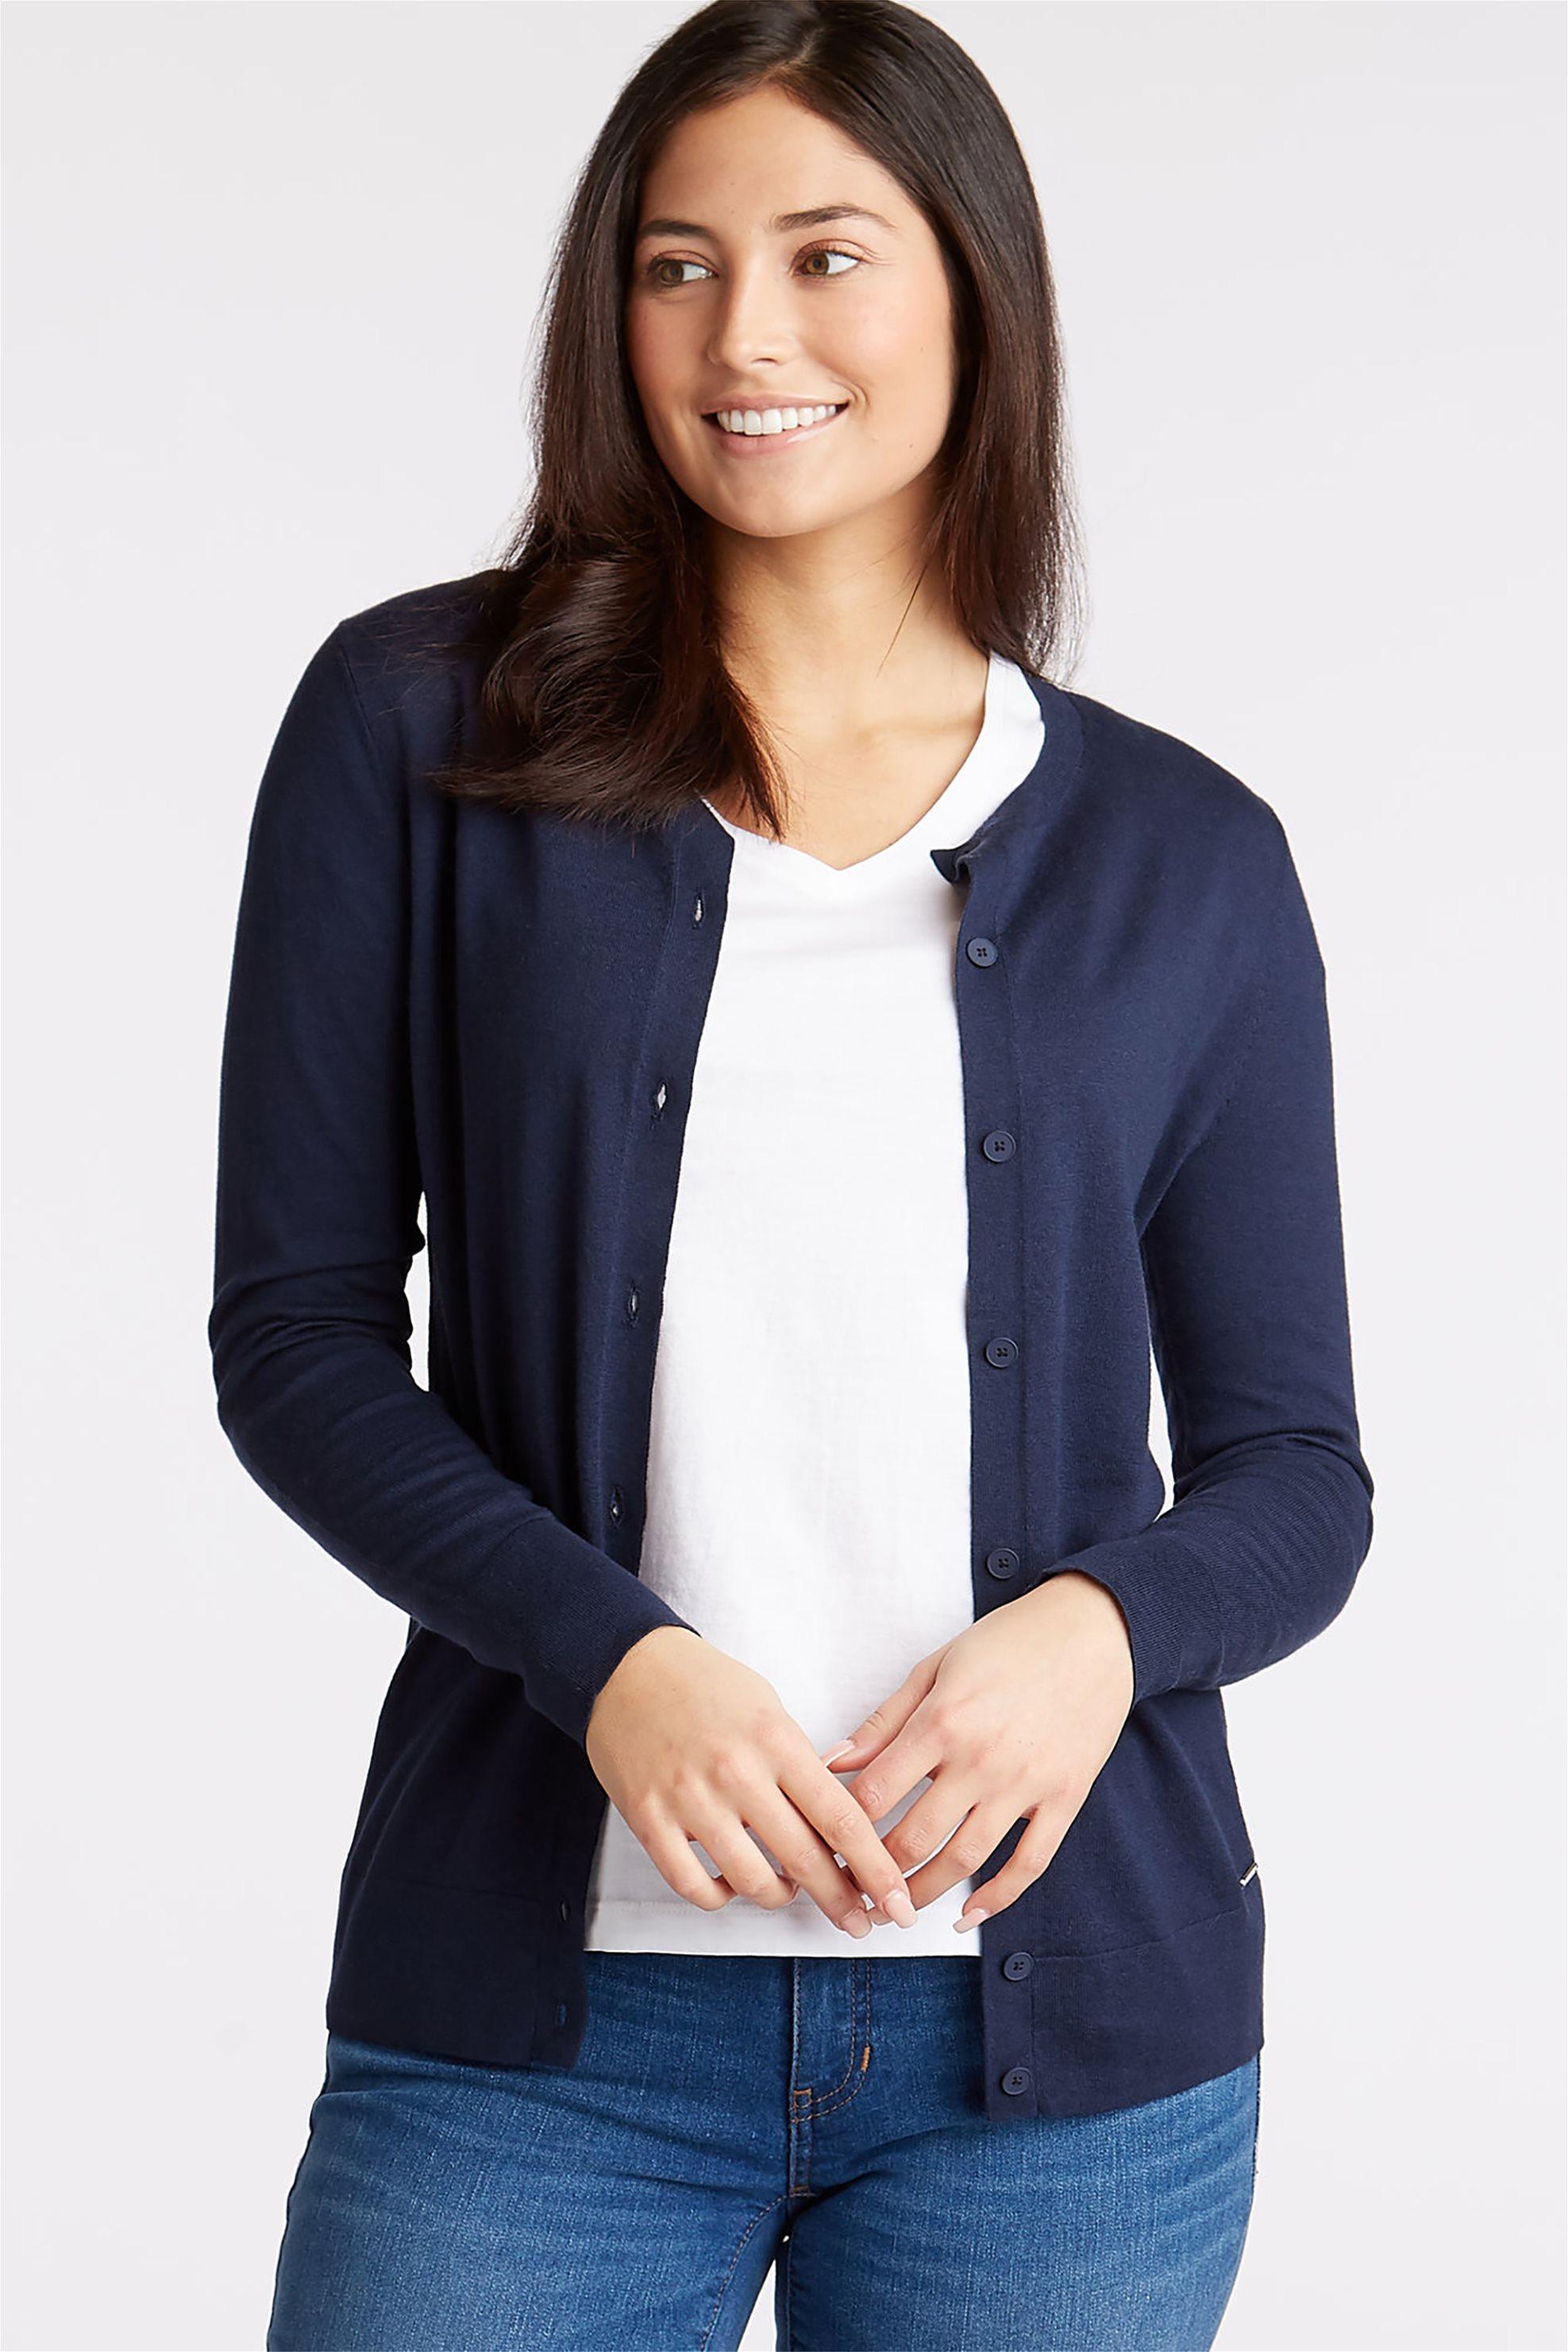 2a8dea3ce8 Προσφορές NAUTICA - Προσφορές Γυναικεία Ρούχα από τα μεγαλύτερα ελληνικά  και ξενα e-shop -